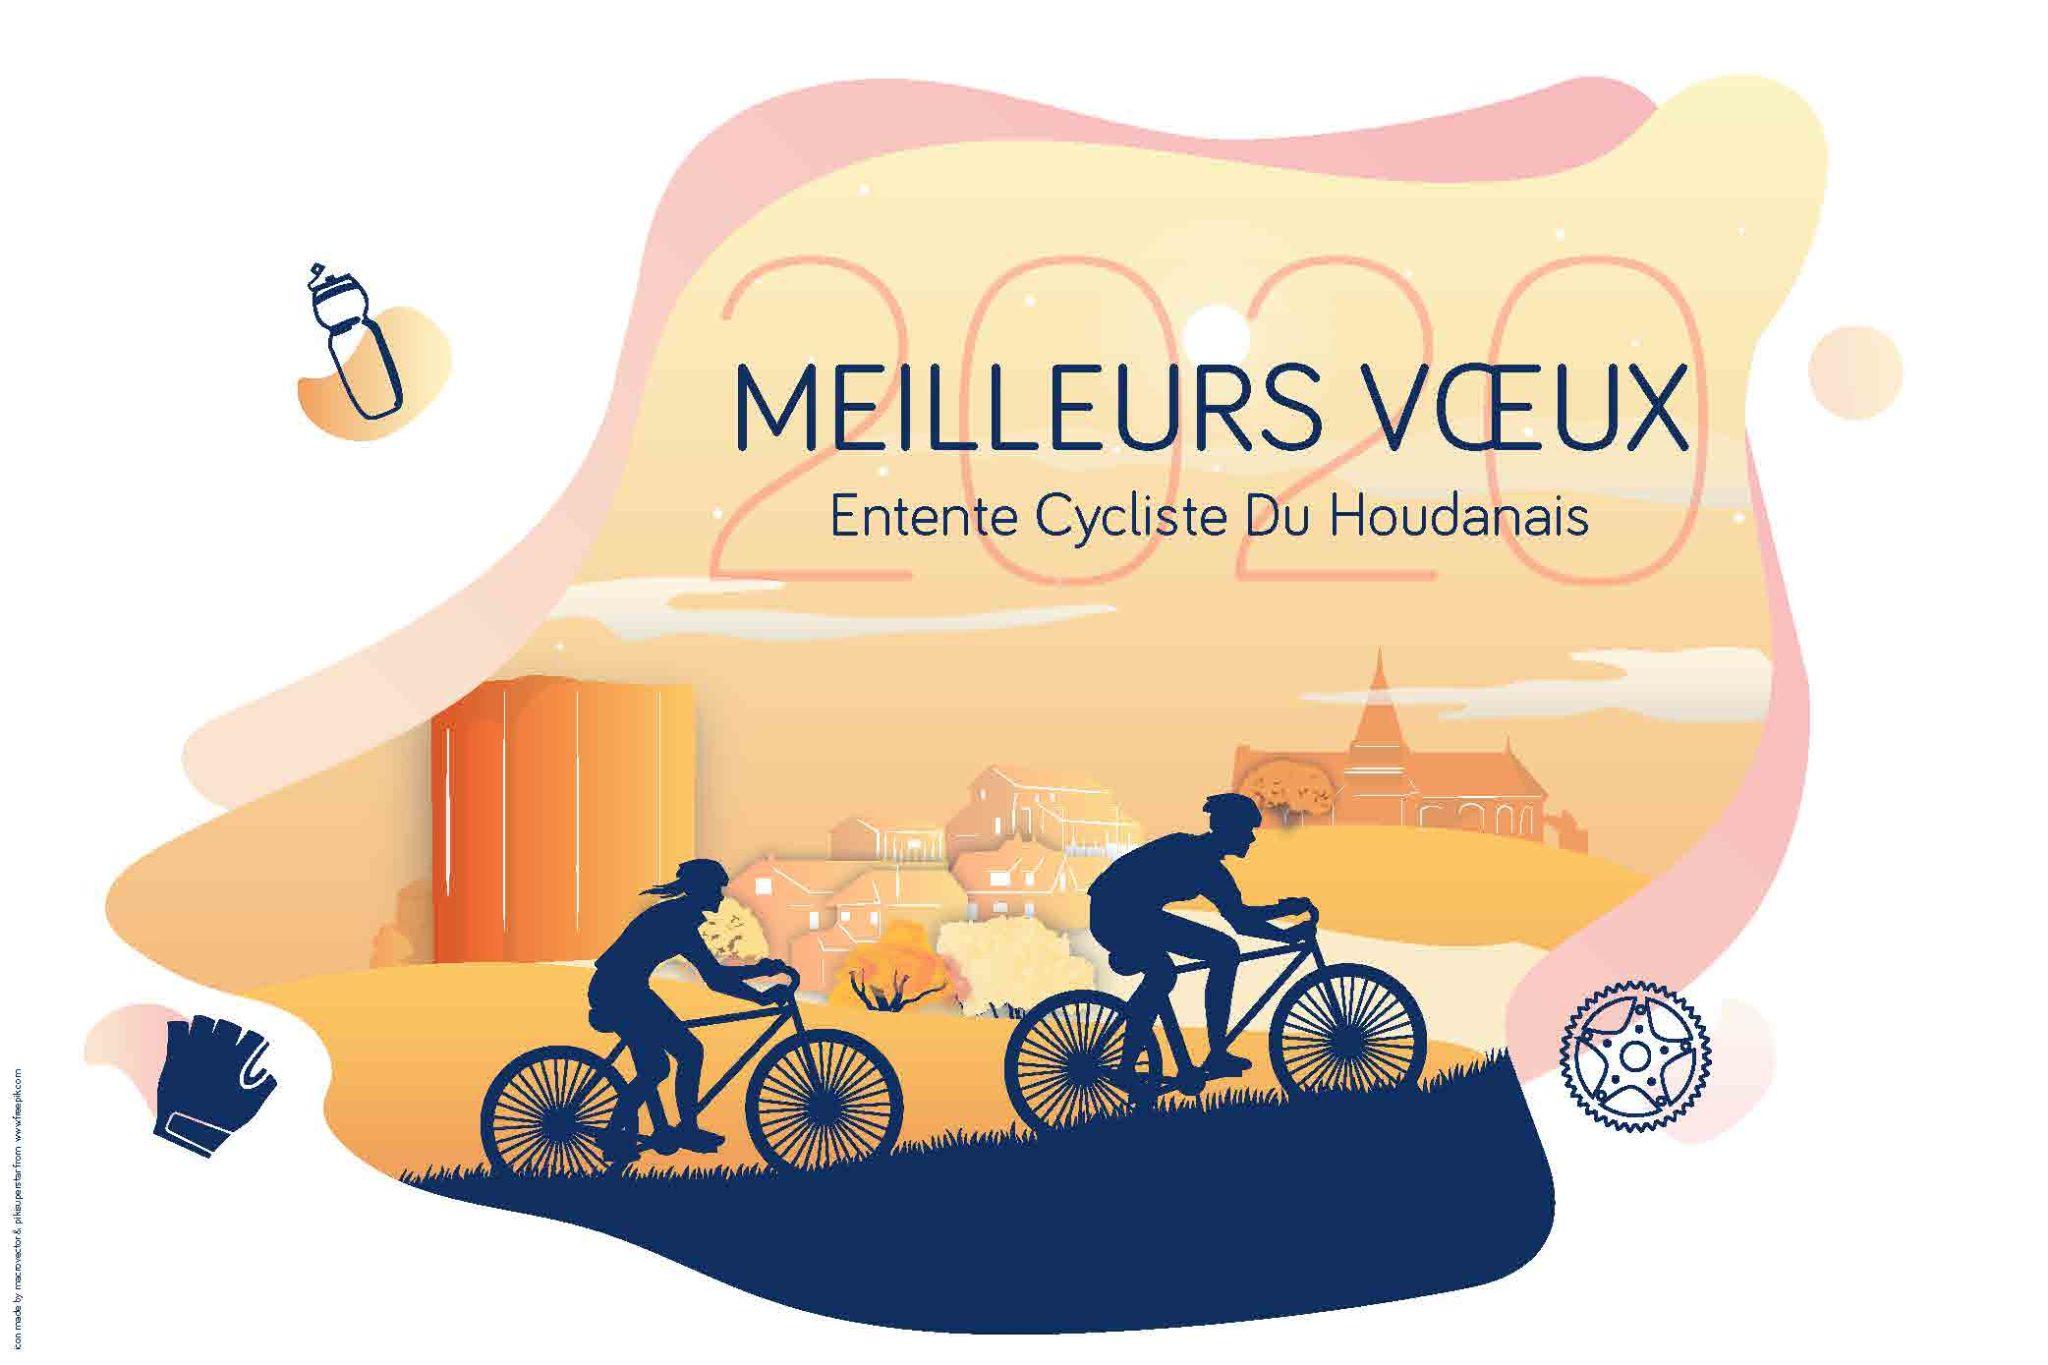 Entente Cycliste Du Houdanais - Conception graphique